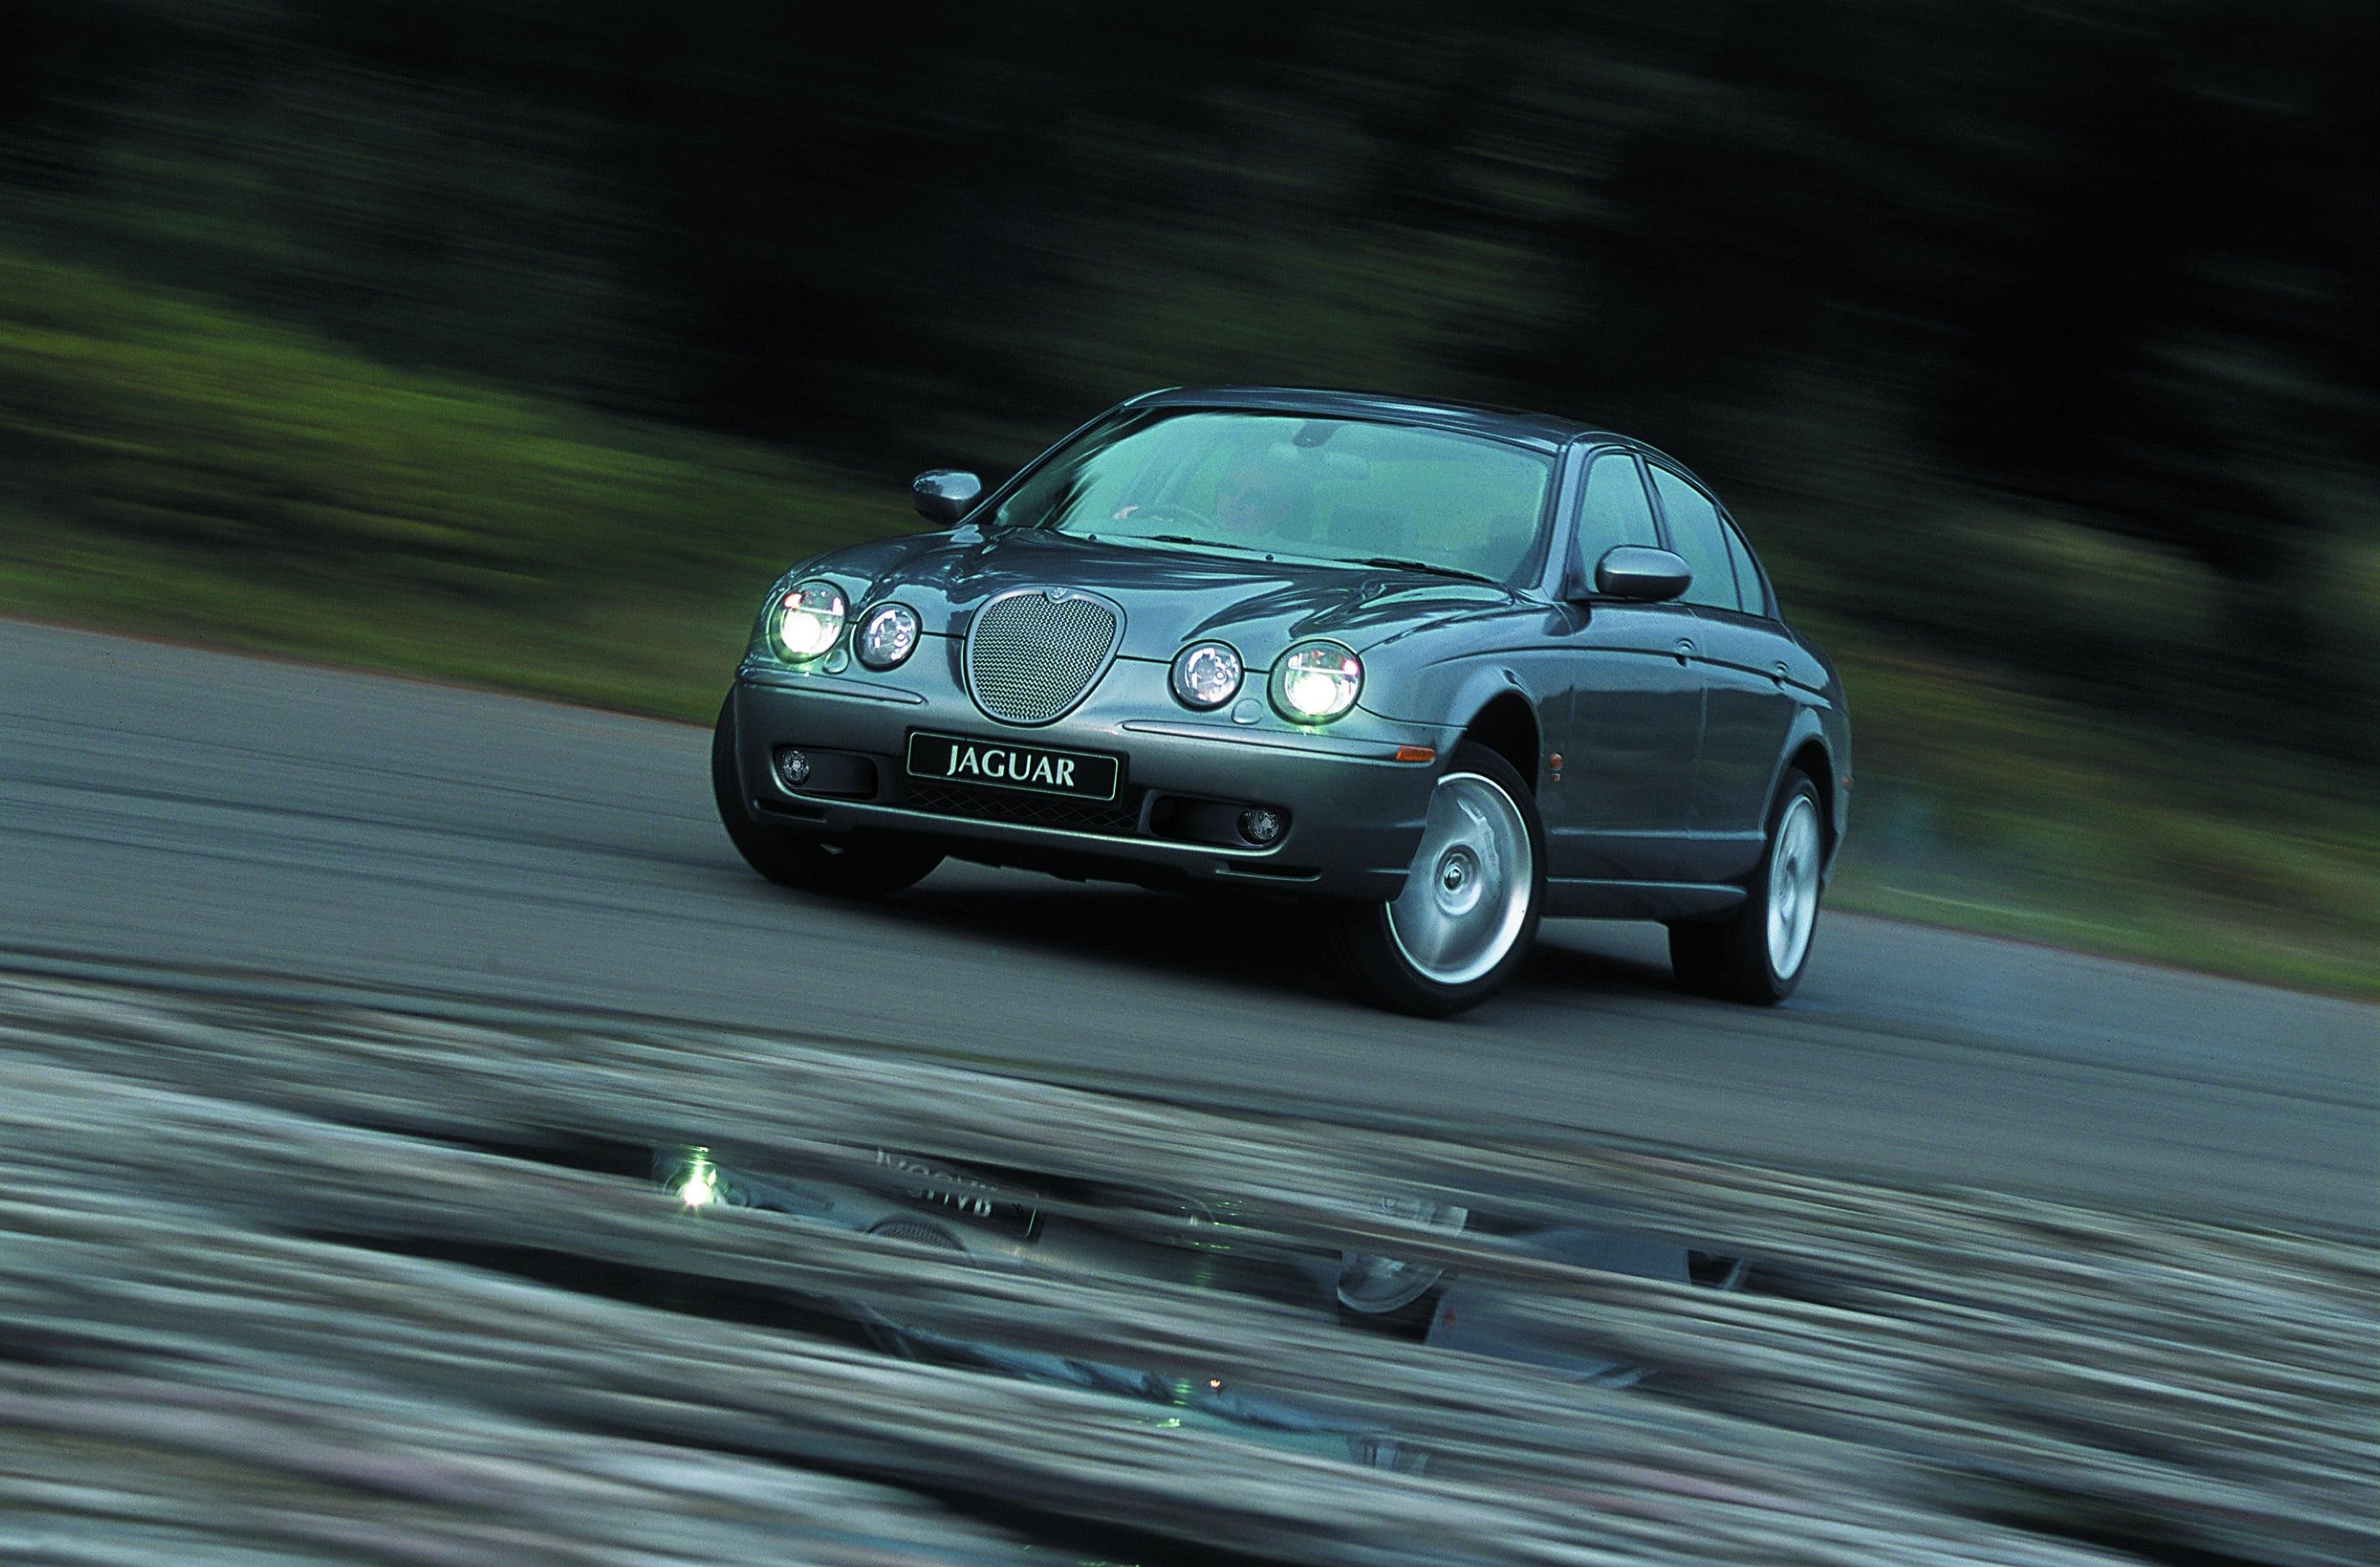 Jaguar S Type, Jaguar XJ, Jaguar, XJ, XJ6, XJ8, XJR U2026